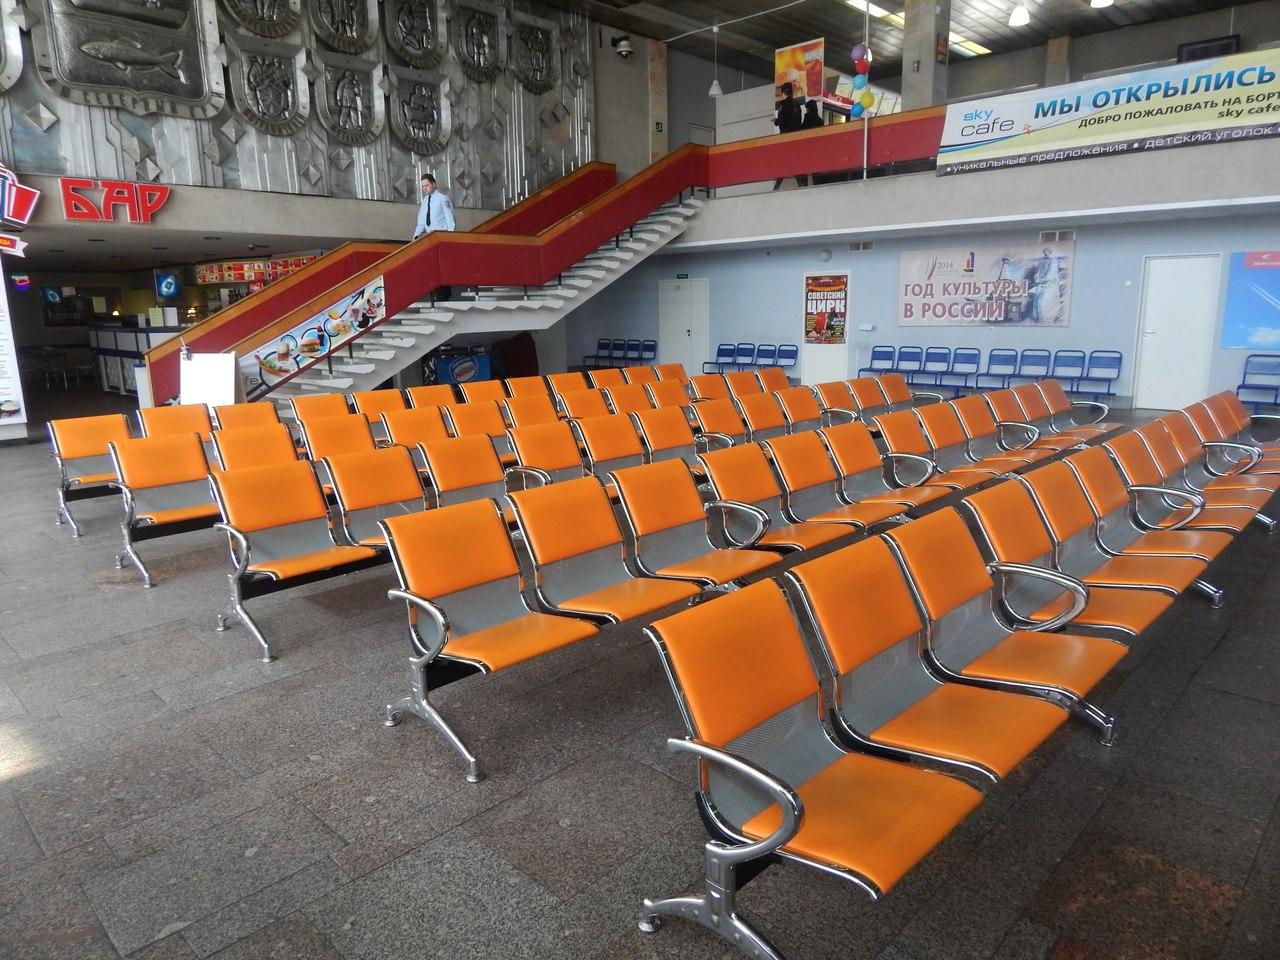 Зал ожидания в аэропорту Мурманск